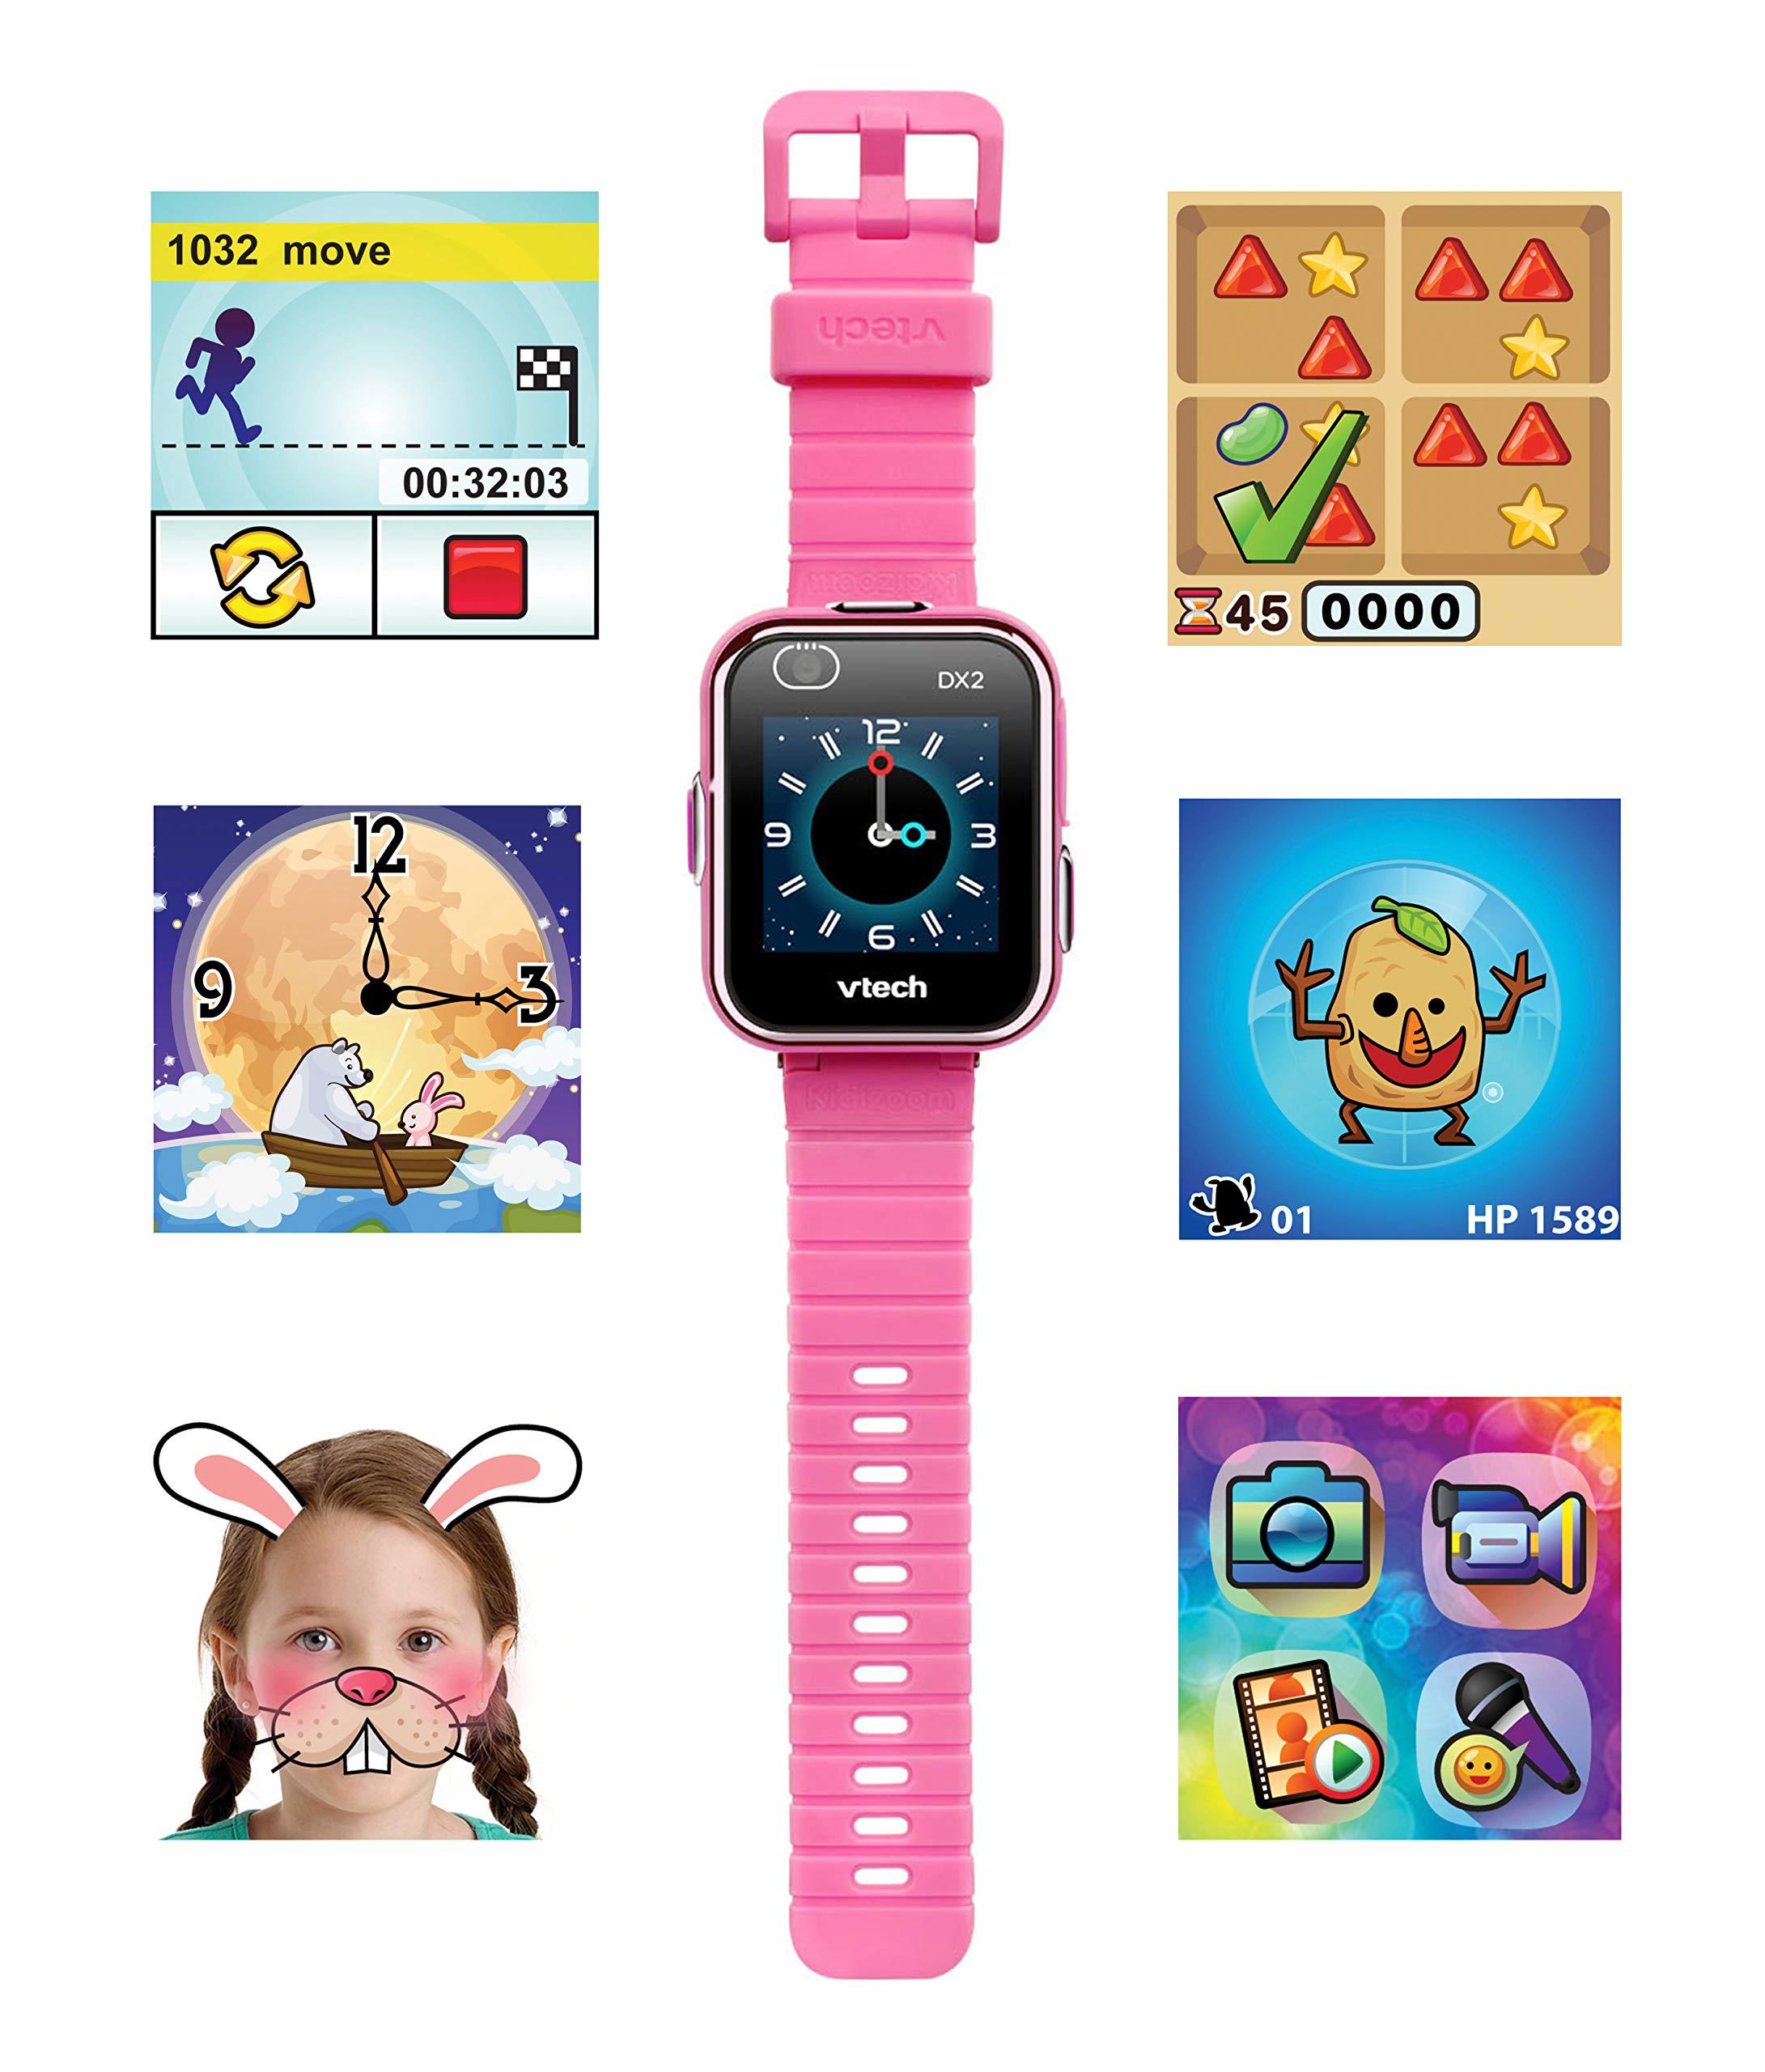 VTech Kidizoom Smart Watch DX2 - Reloj inteligente para niños con doble cámara 3